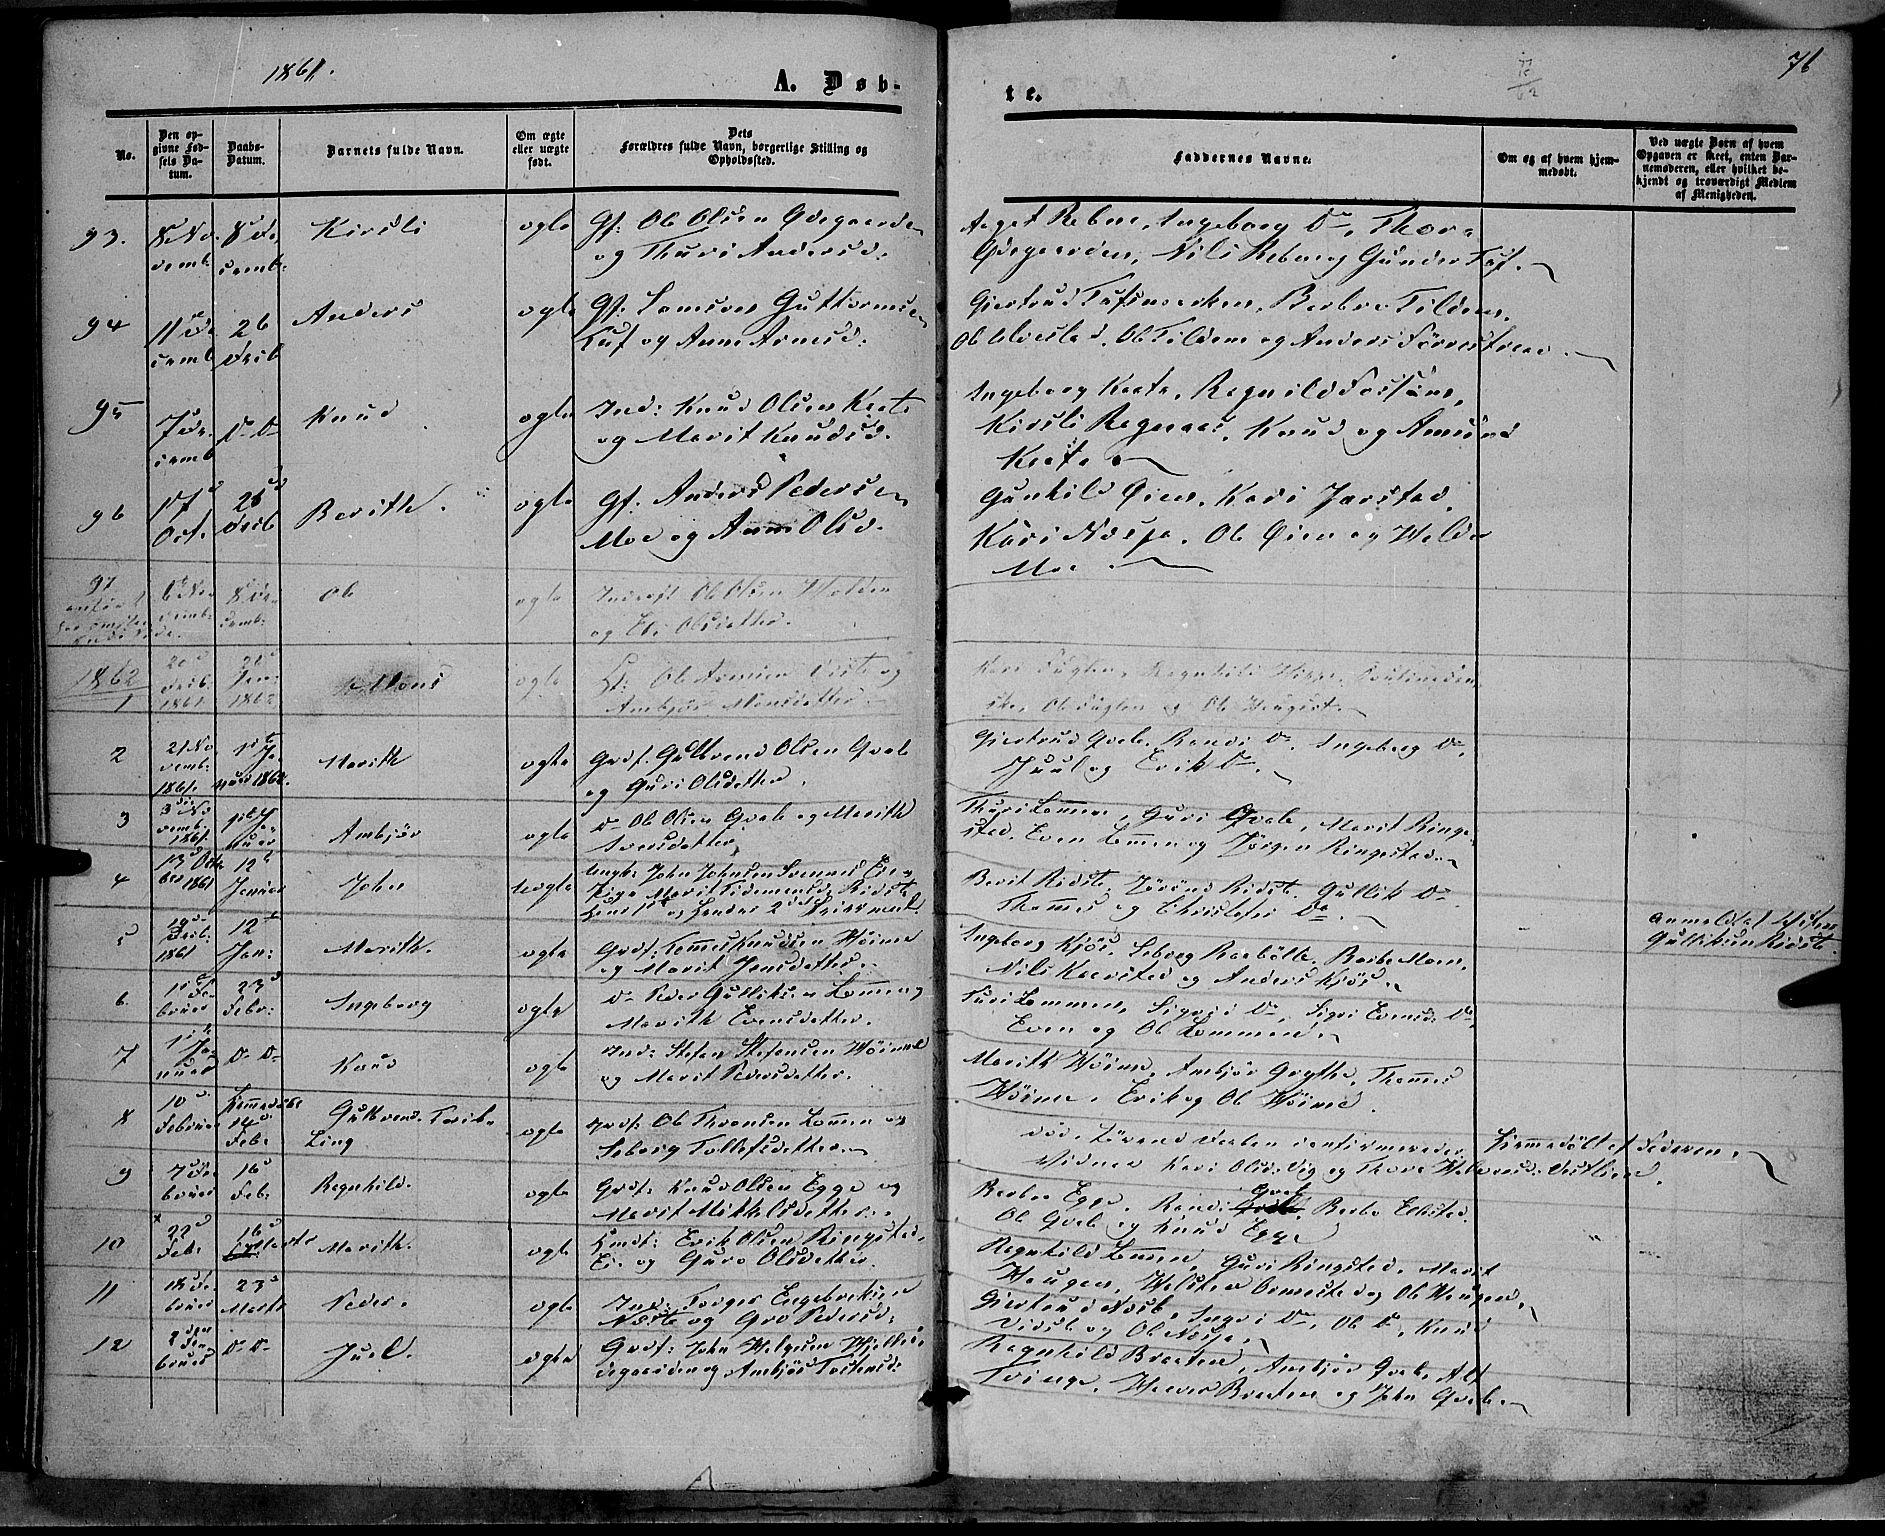 SAH, Vestre Slidre prestekontor, Ministerialbok nr. 2, 1856-1864, s. 76